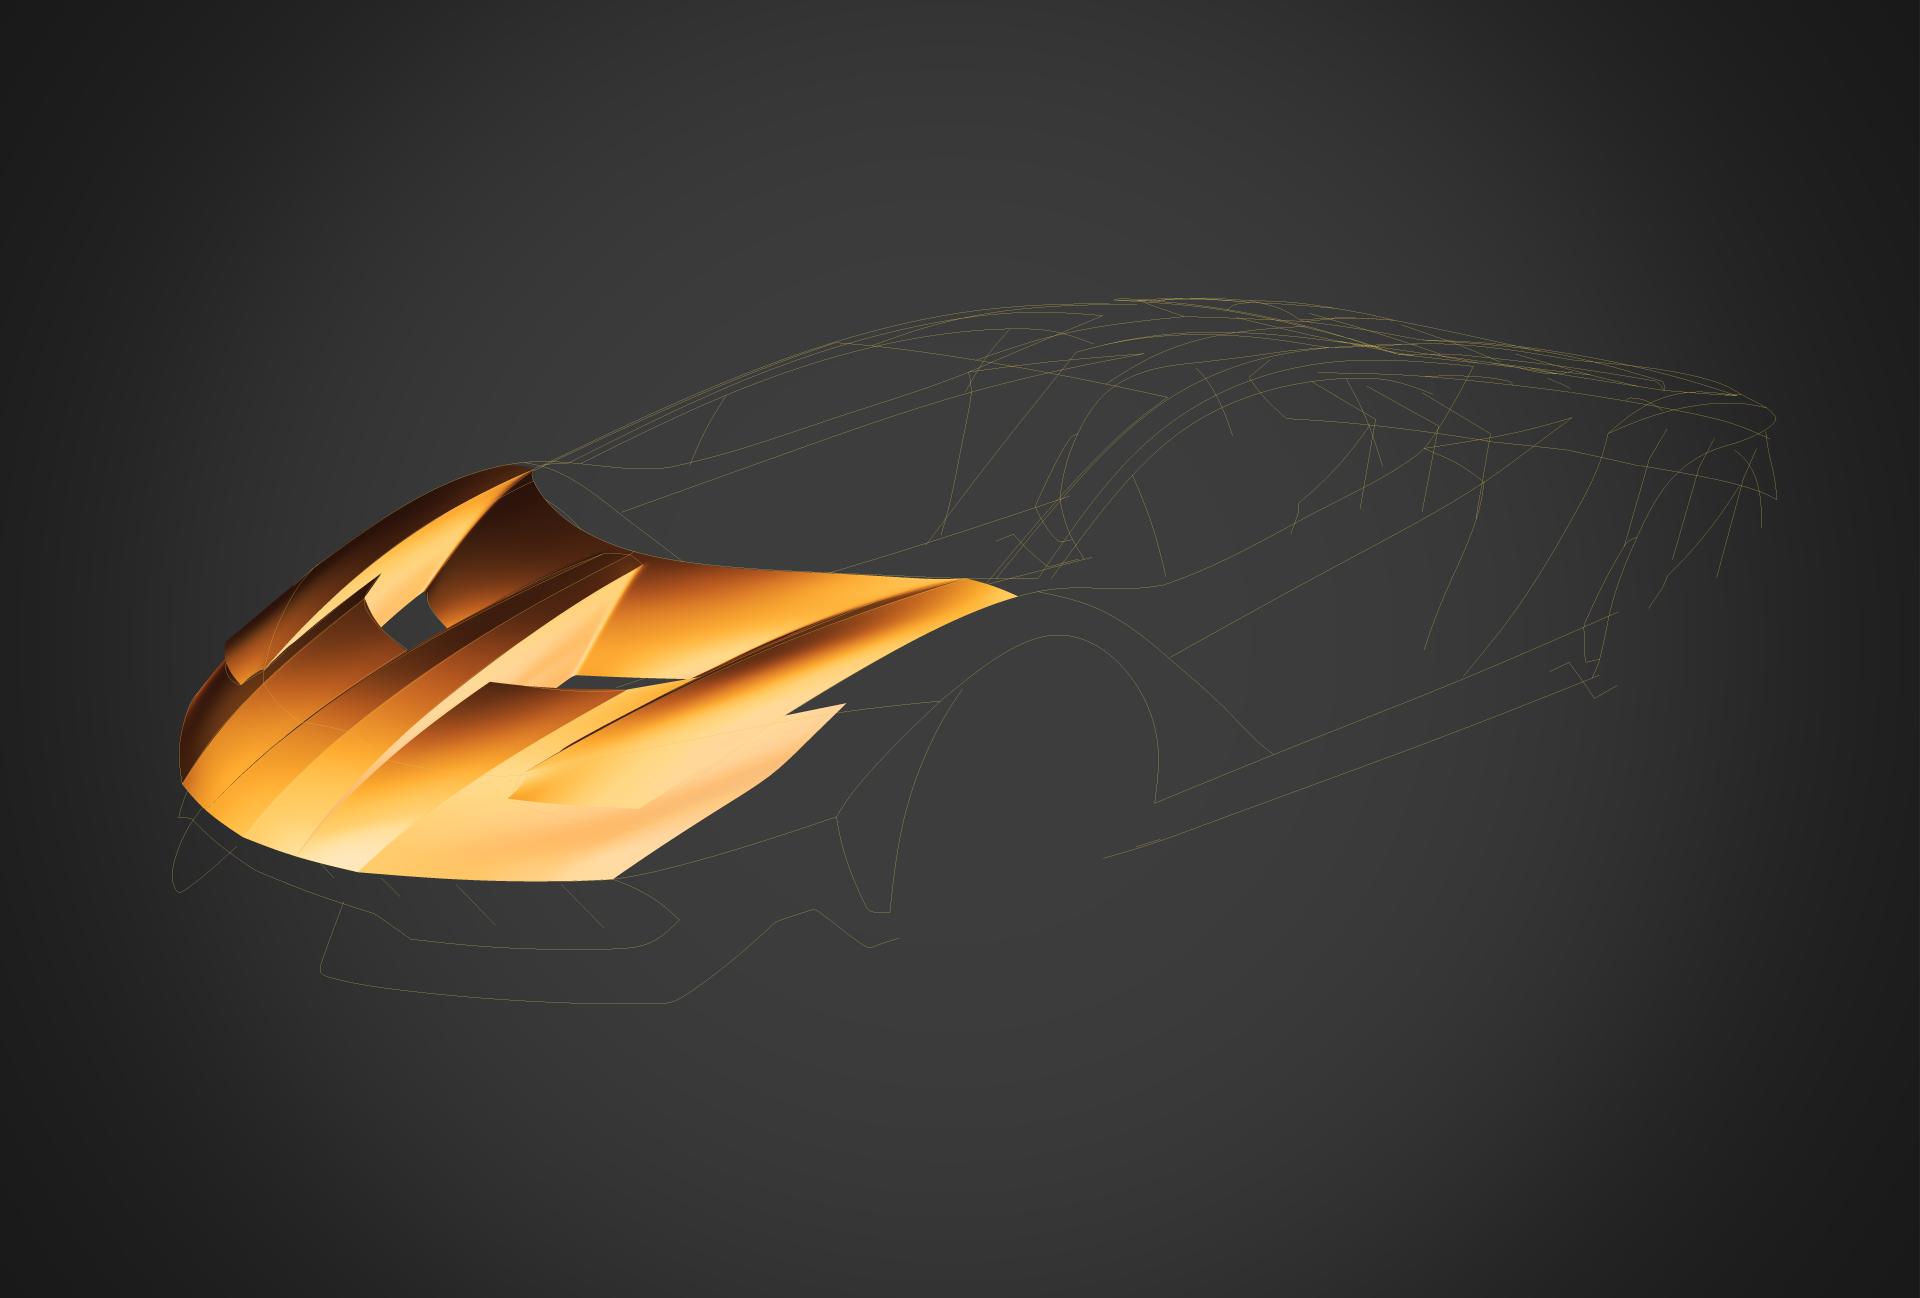 Lamborghini Centenario Lp 770 4 Car Render Challenge 2016 Wip